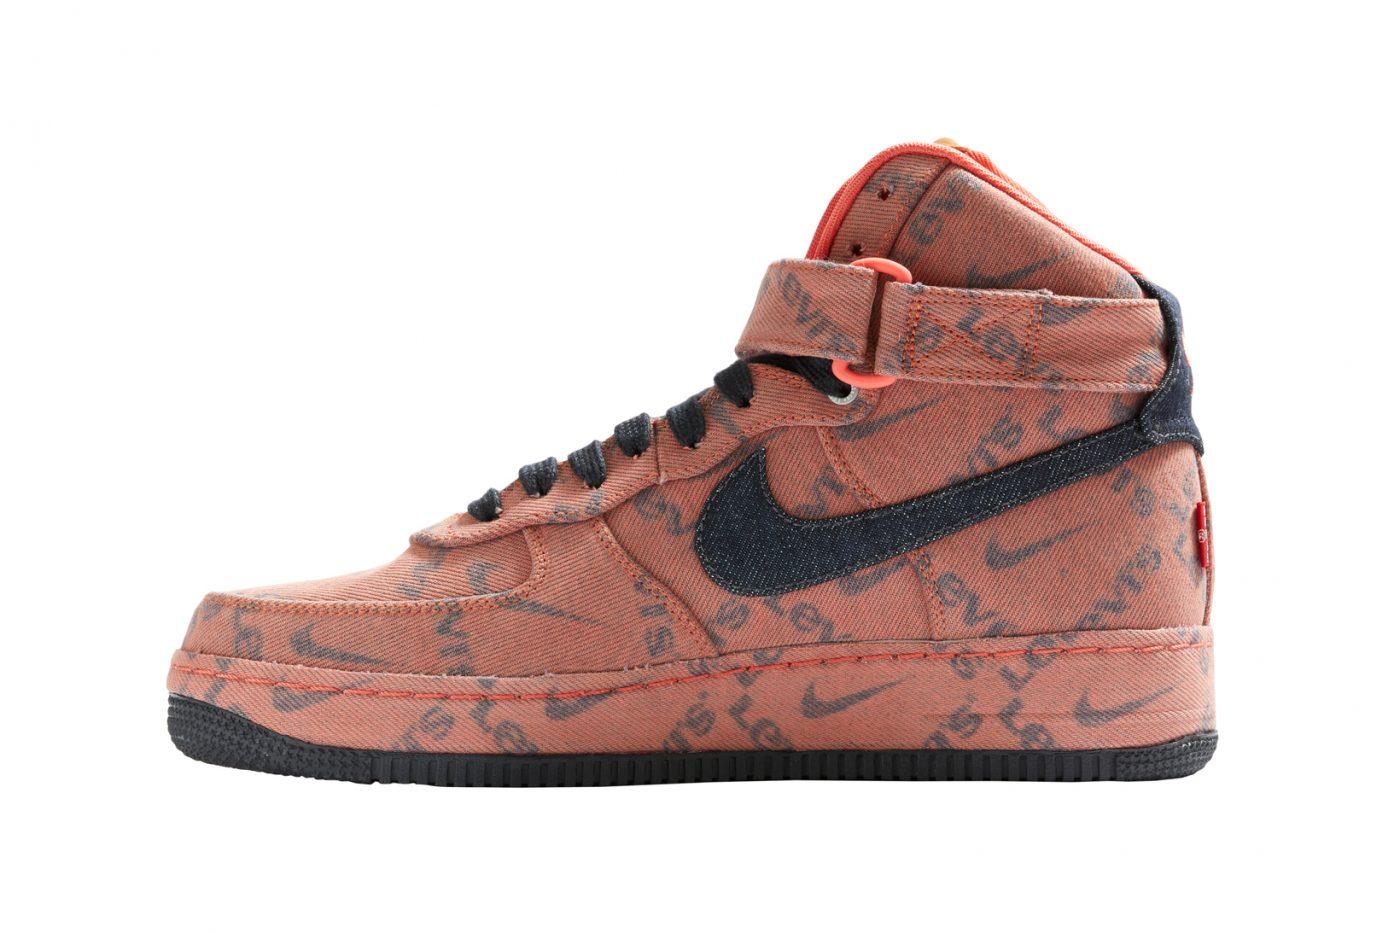 LEVIS x Nike Air Force 1 Custom Denim Limited Edition Size